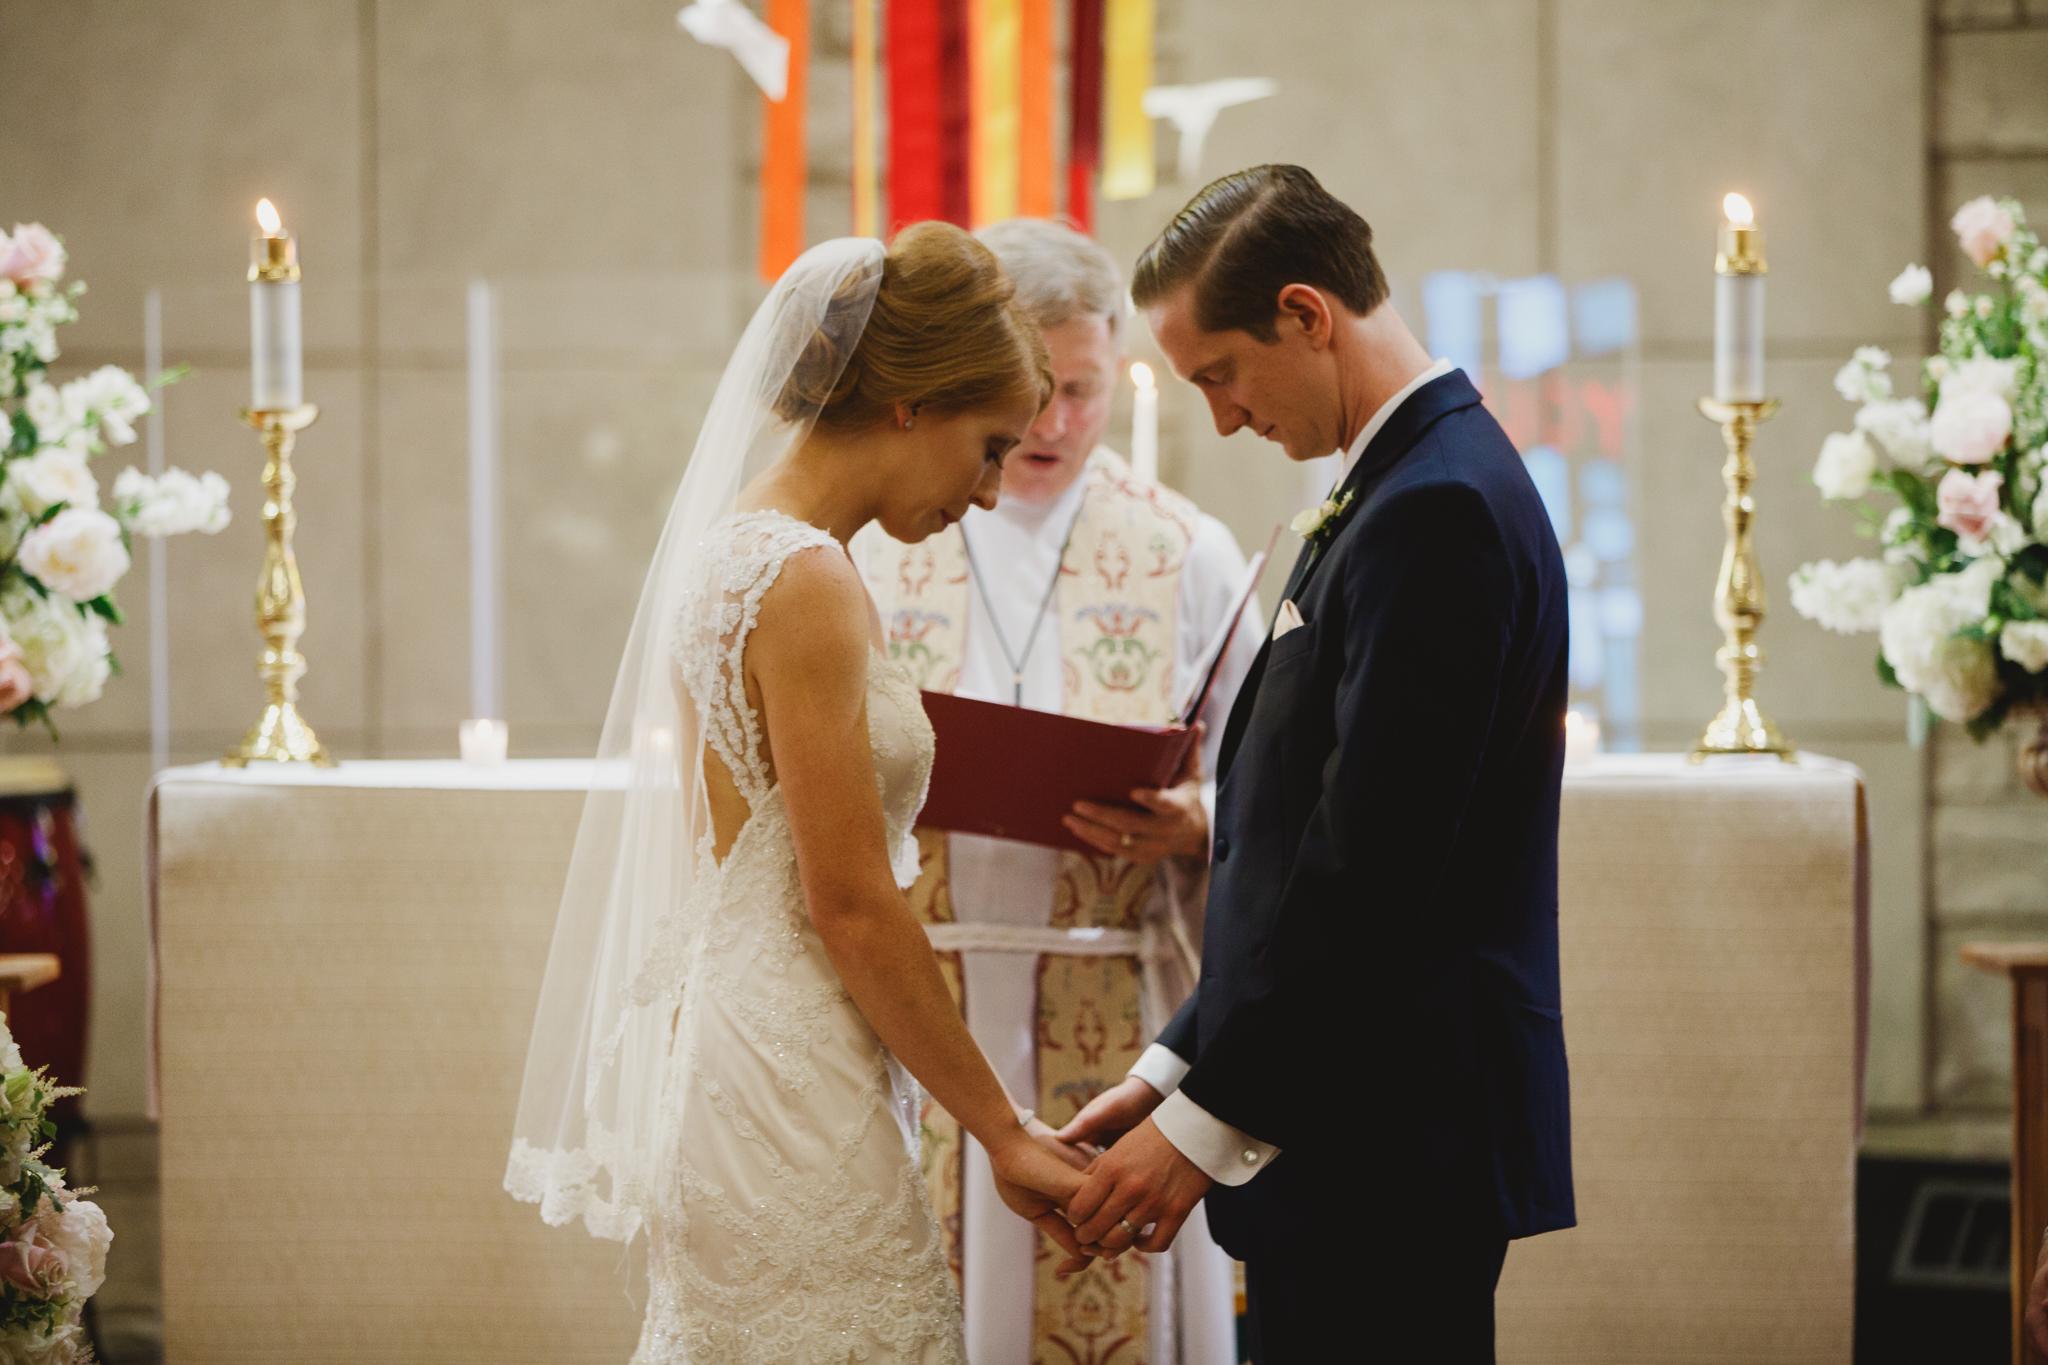 Michael and Kelly - the ashton depot - wedding DFW - wedding photographer- elizalde photography (51 of 150).jpg